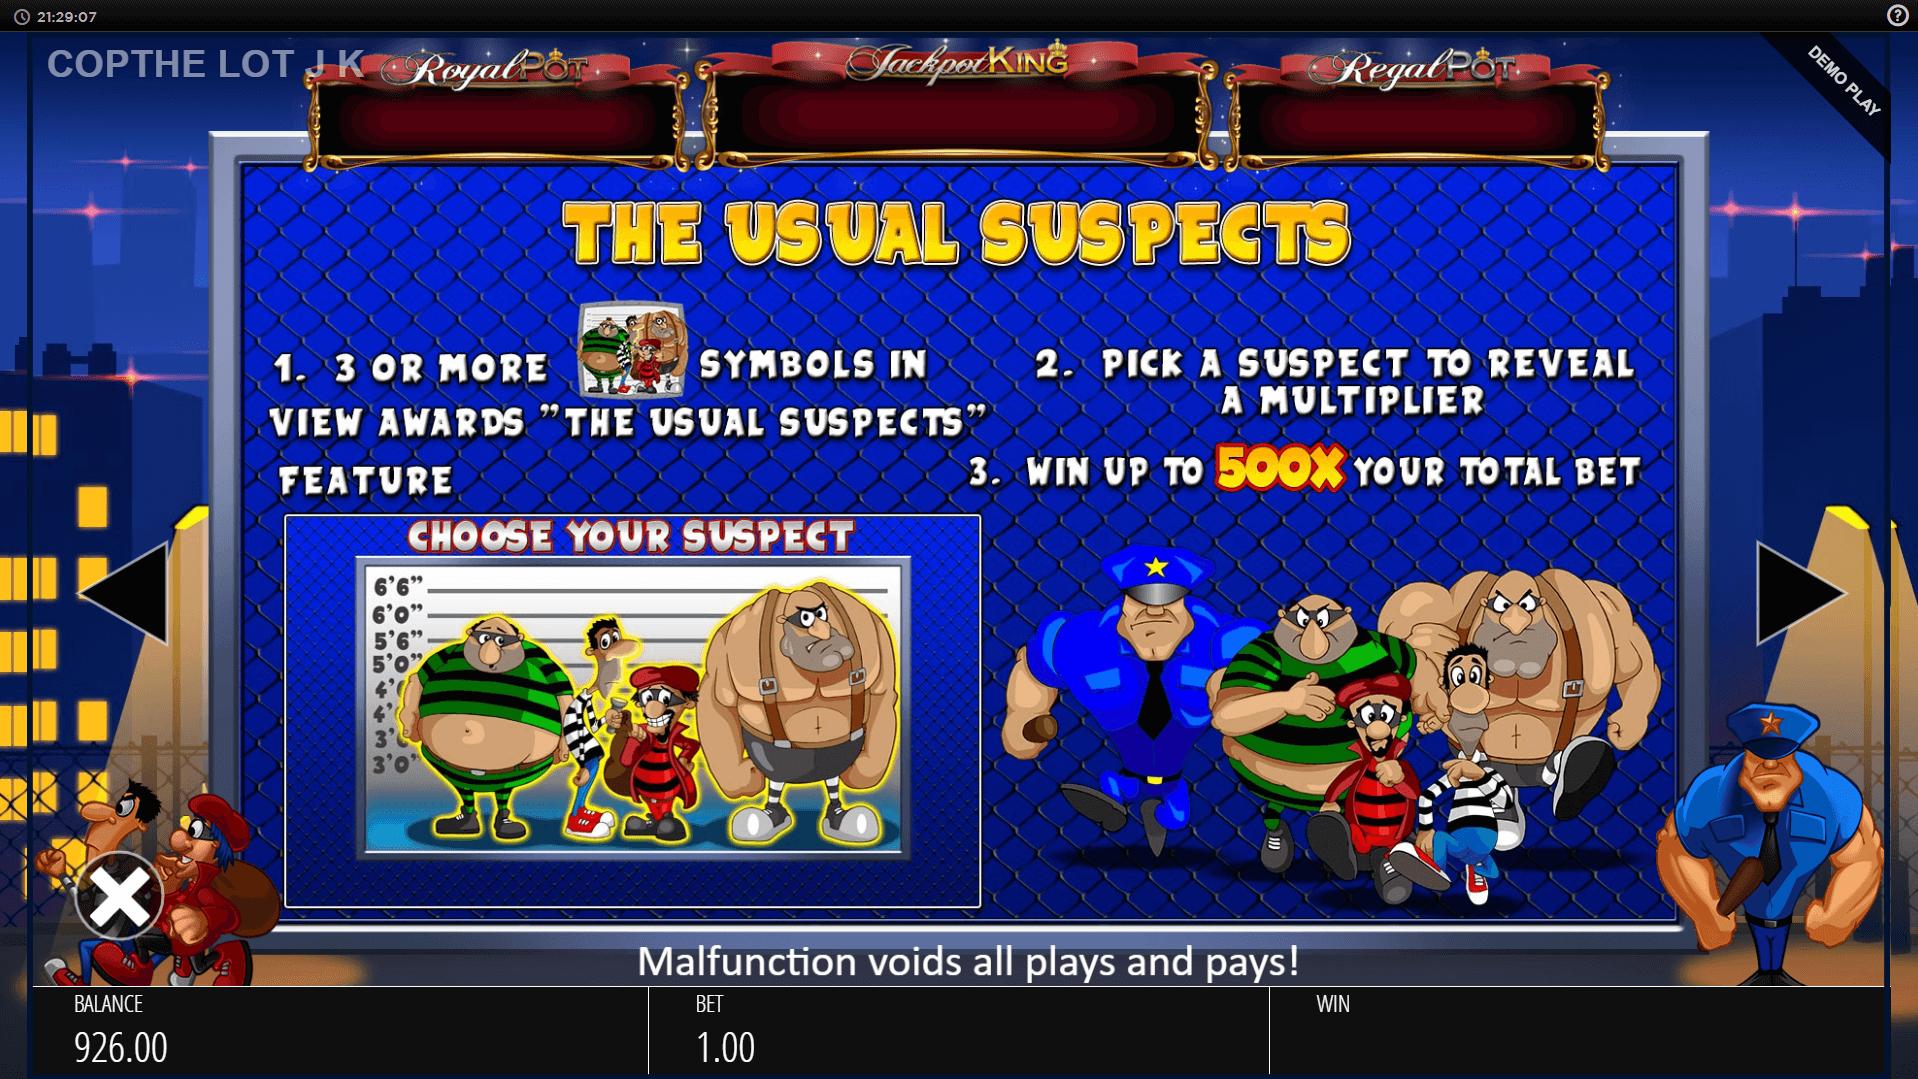 Cop the Lot Jackpot King Slot Machine